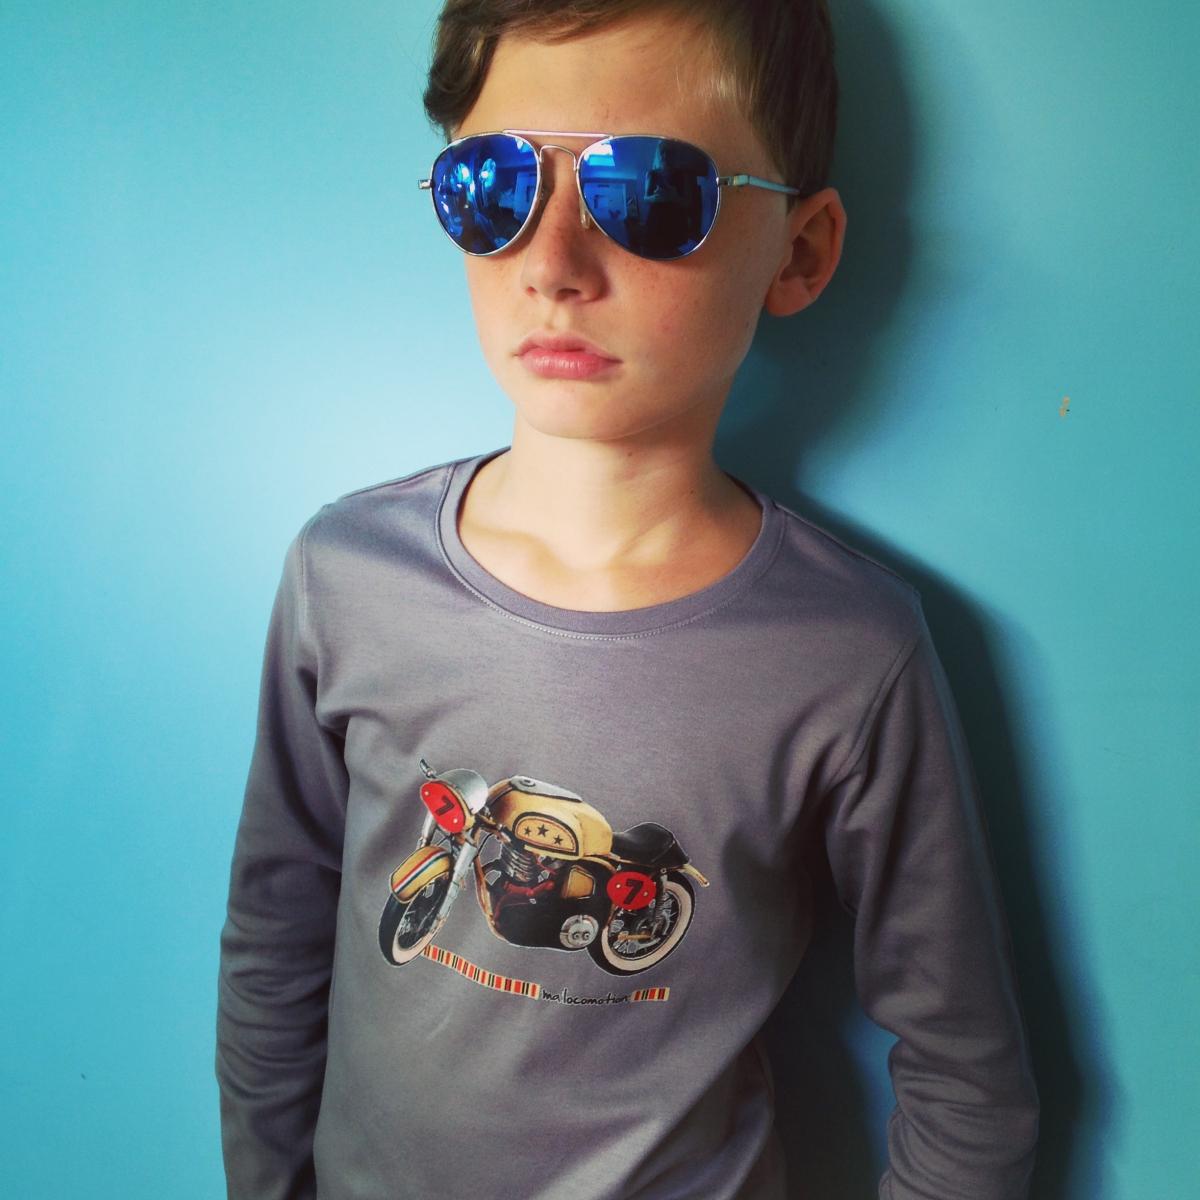 Vintage mototrcycle t-shirt - grey